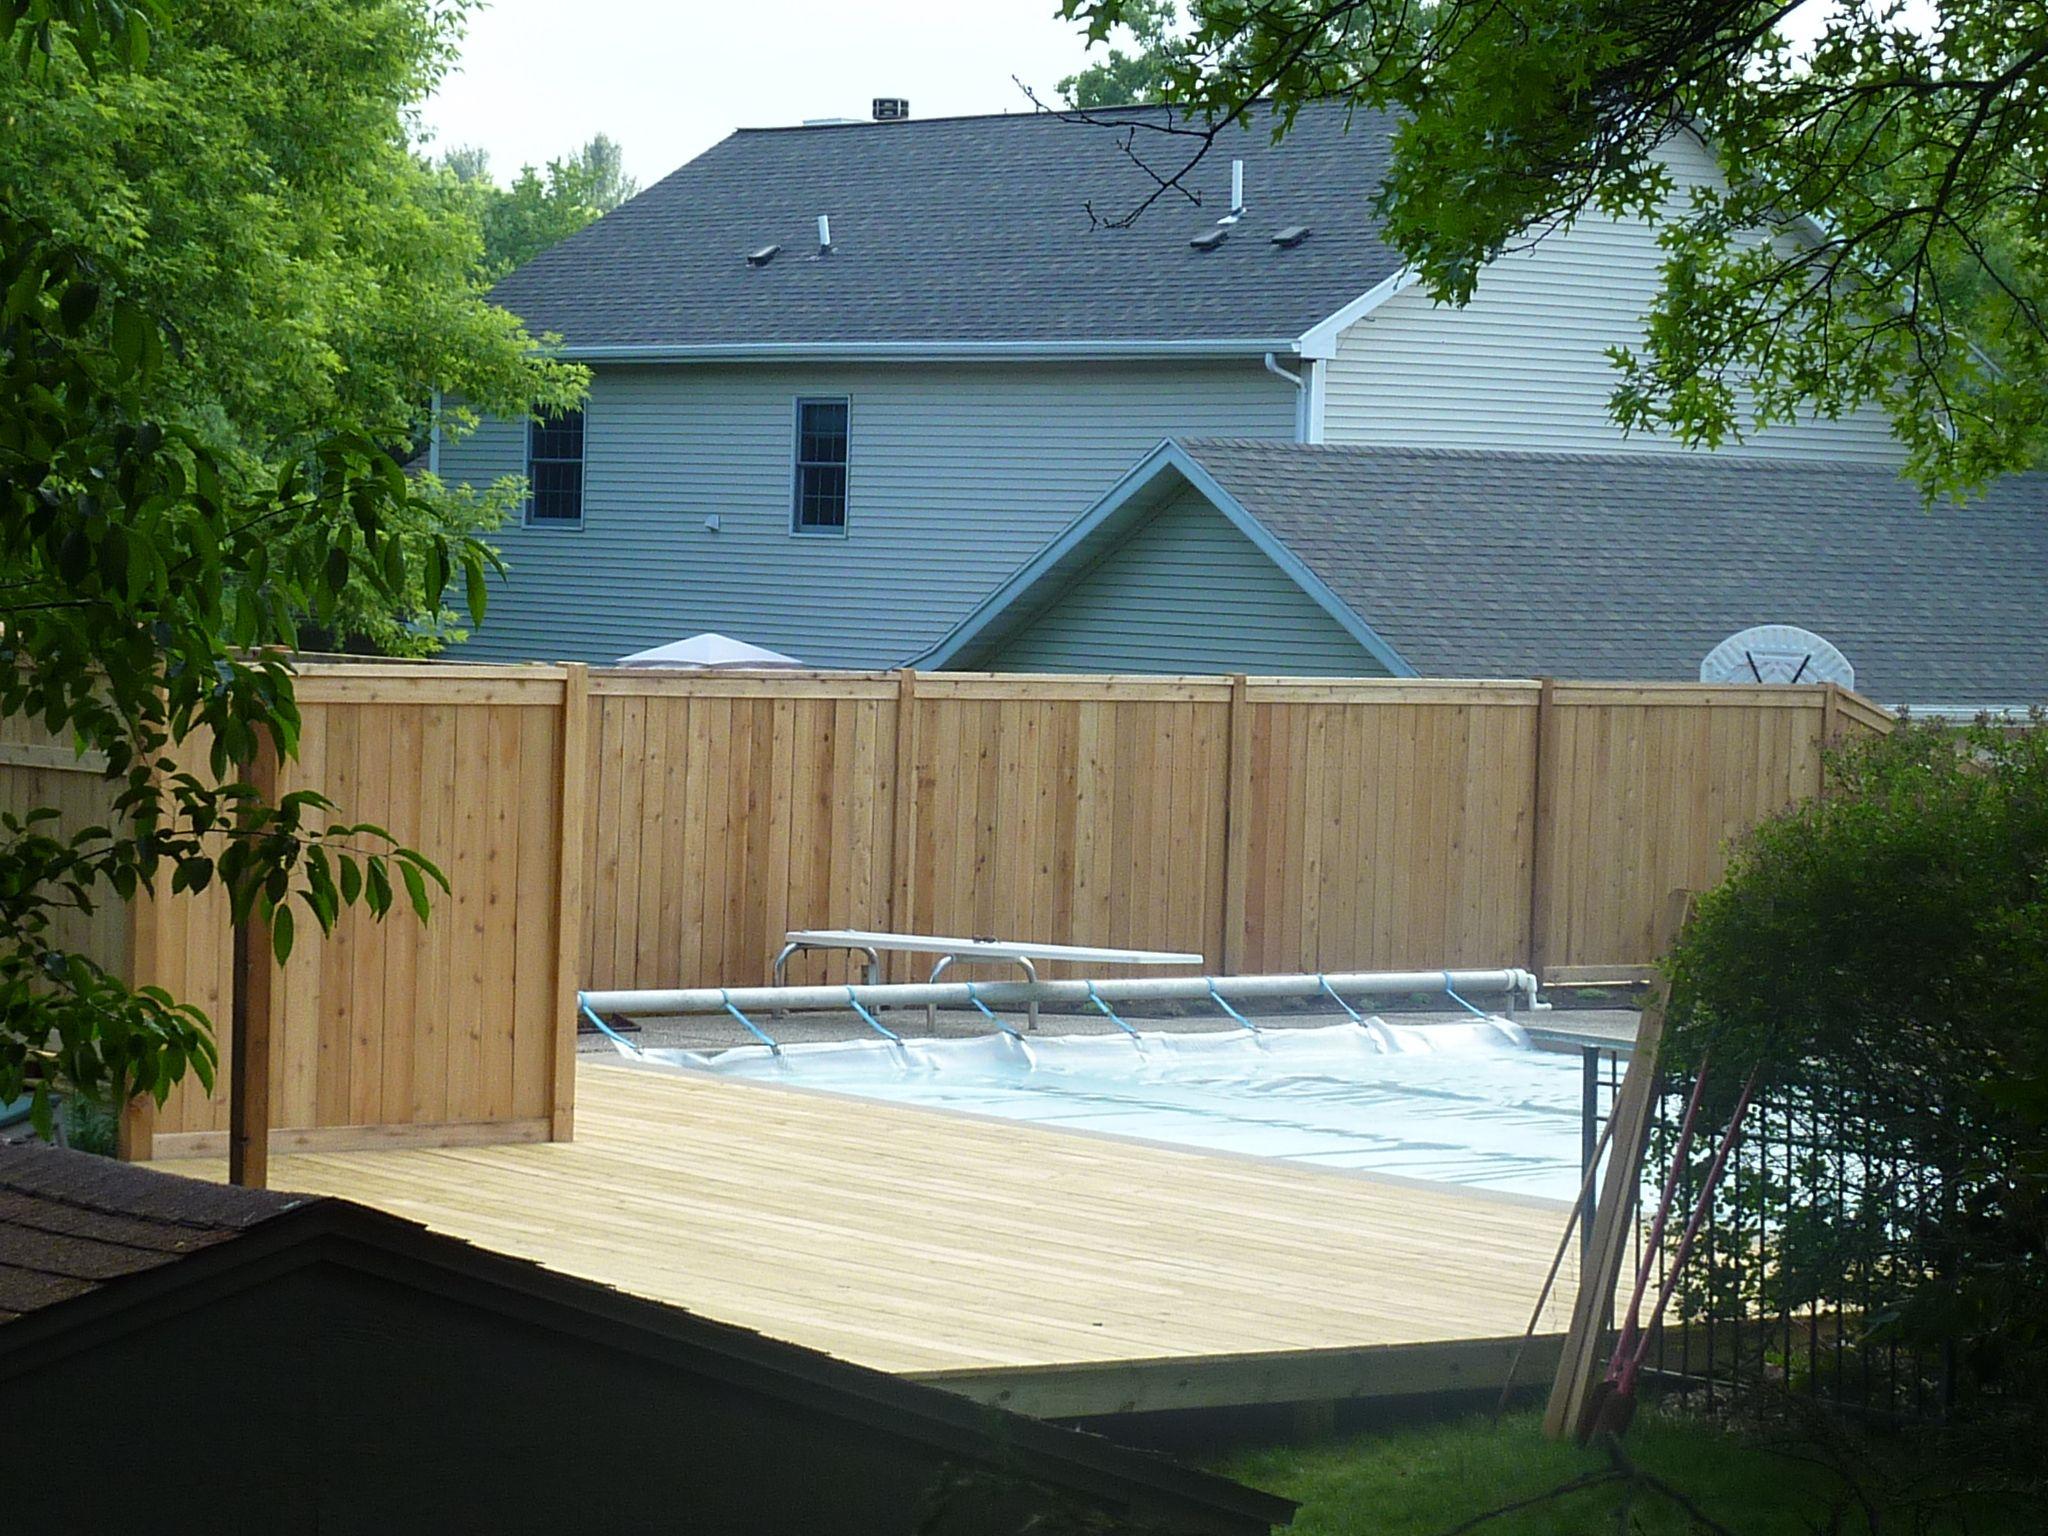 Custom Cedar Privacy Fence Around Pool Fence Built On Top Of